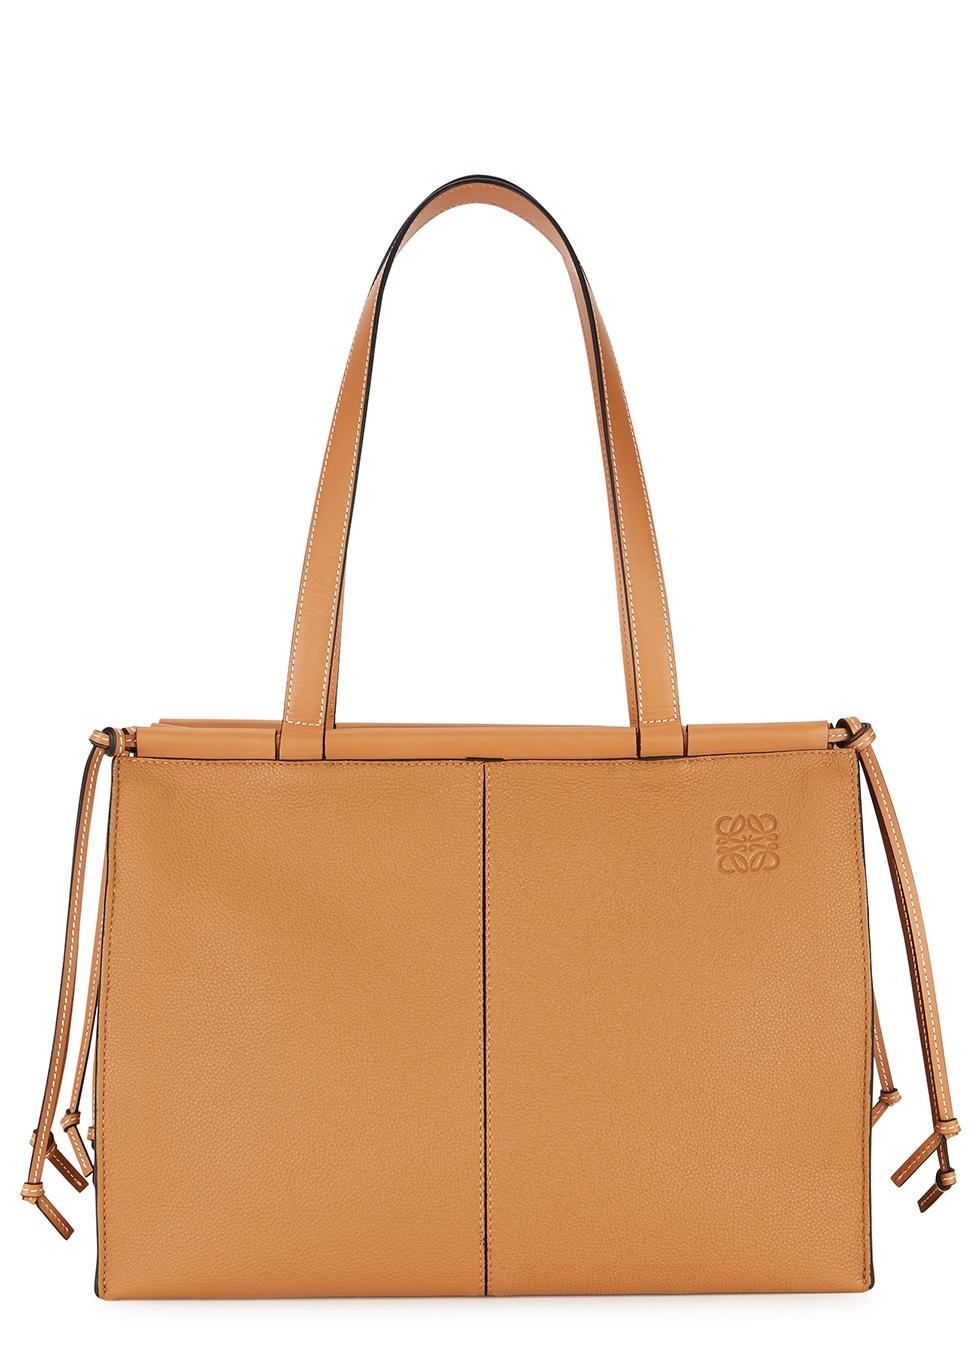 Cushion medium brown leather tote